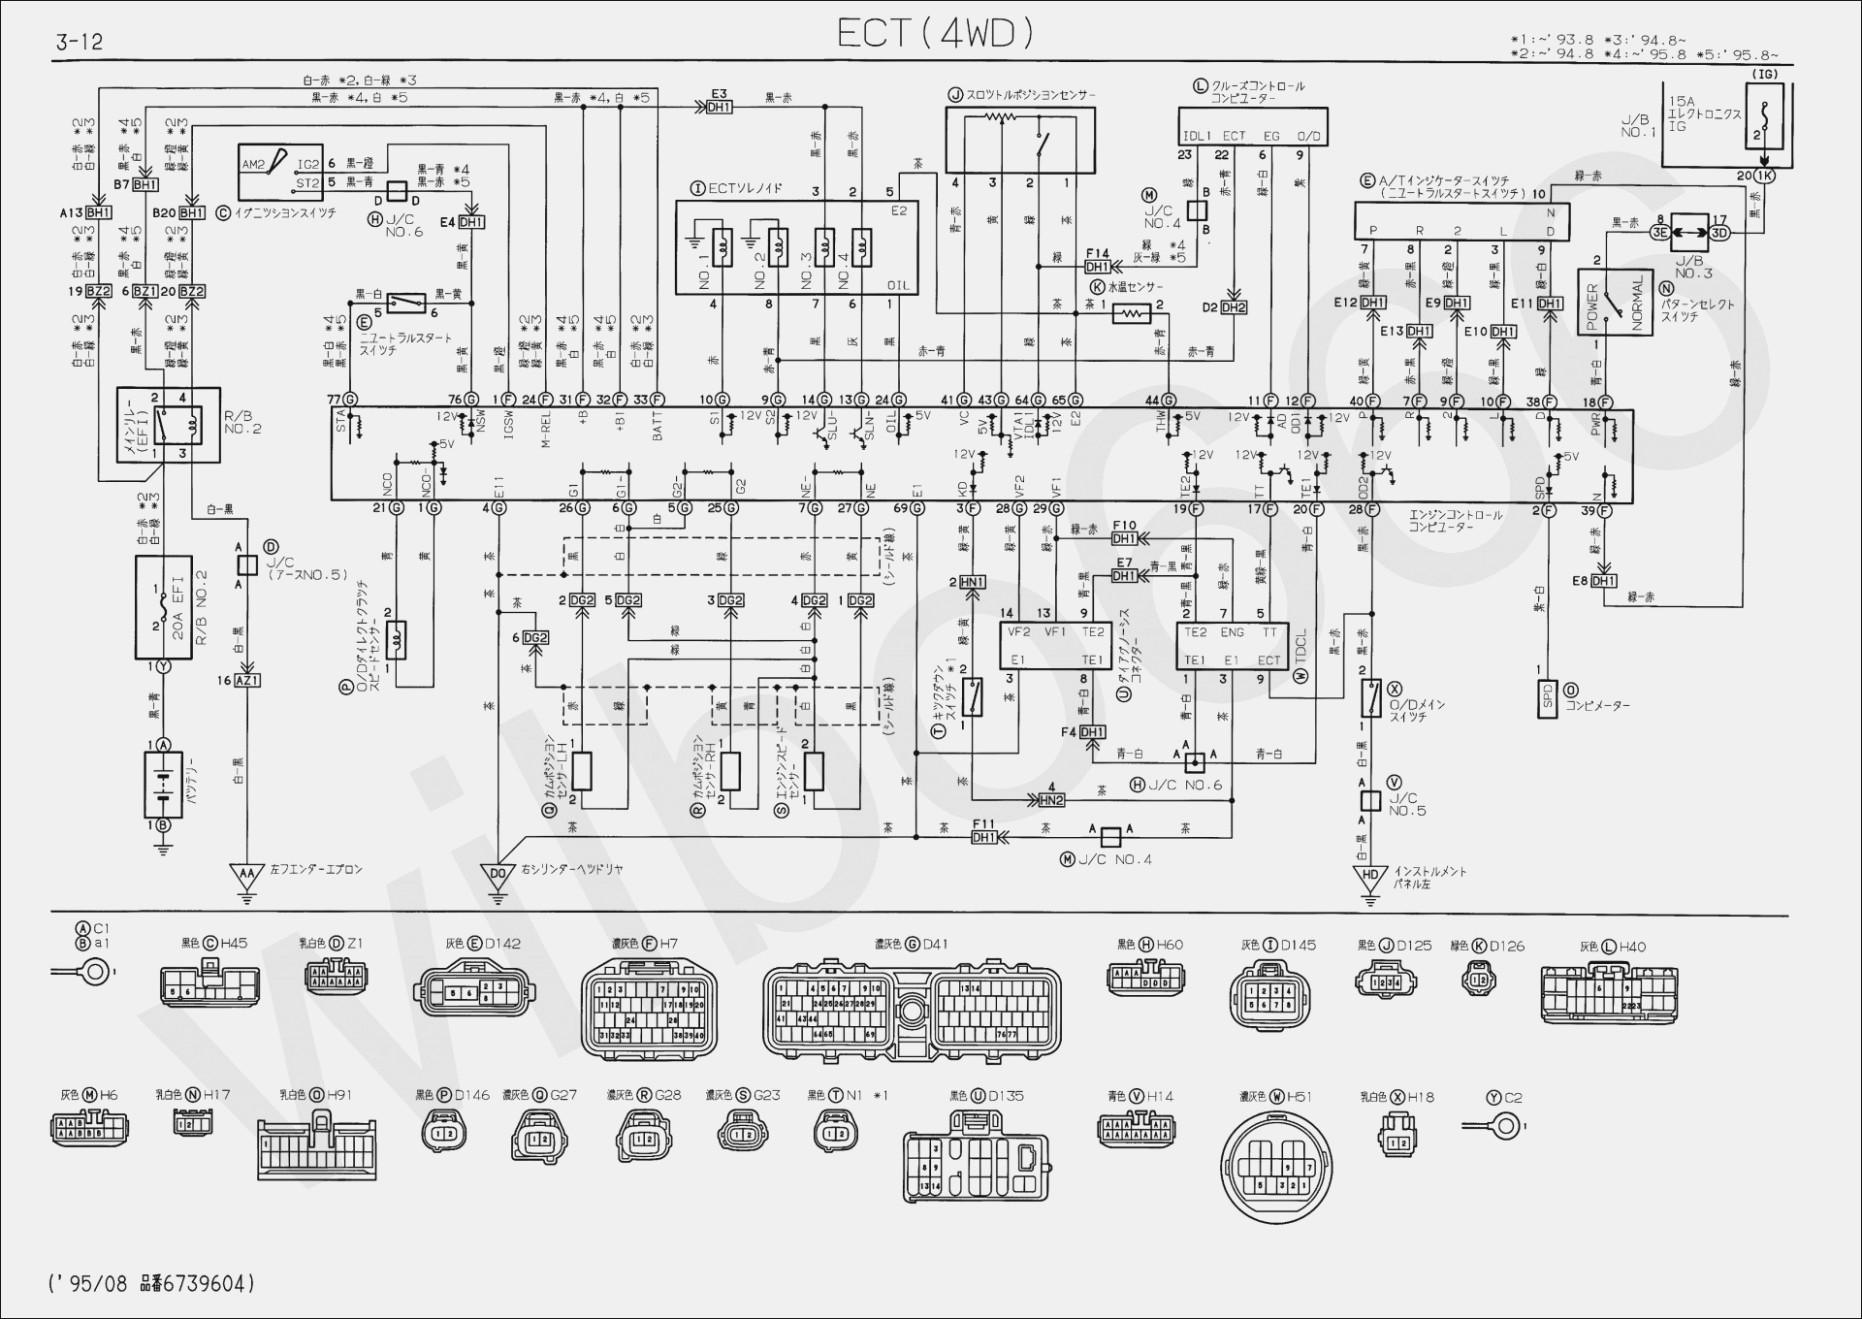 1994 toyota Corolla Wiring Diagram toyota Alternator Wiring Diagram Pdf Of 1994 toyota Corolla Wiring Diagram